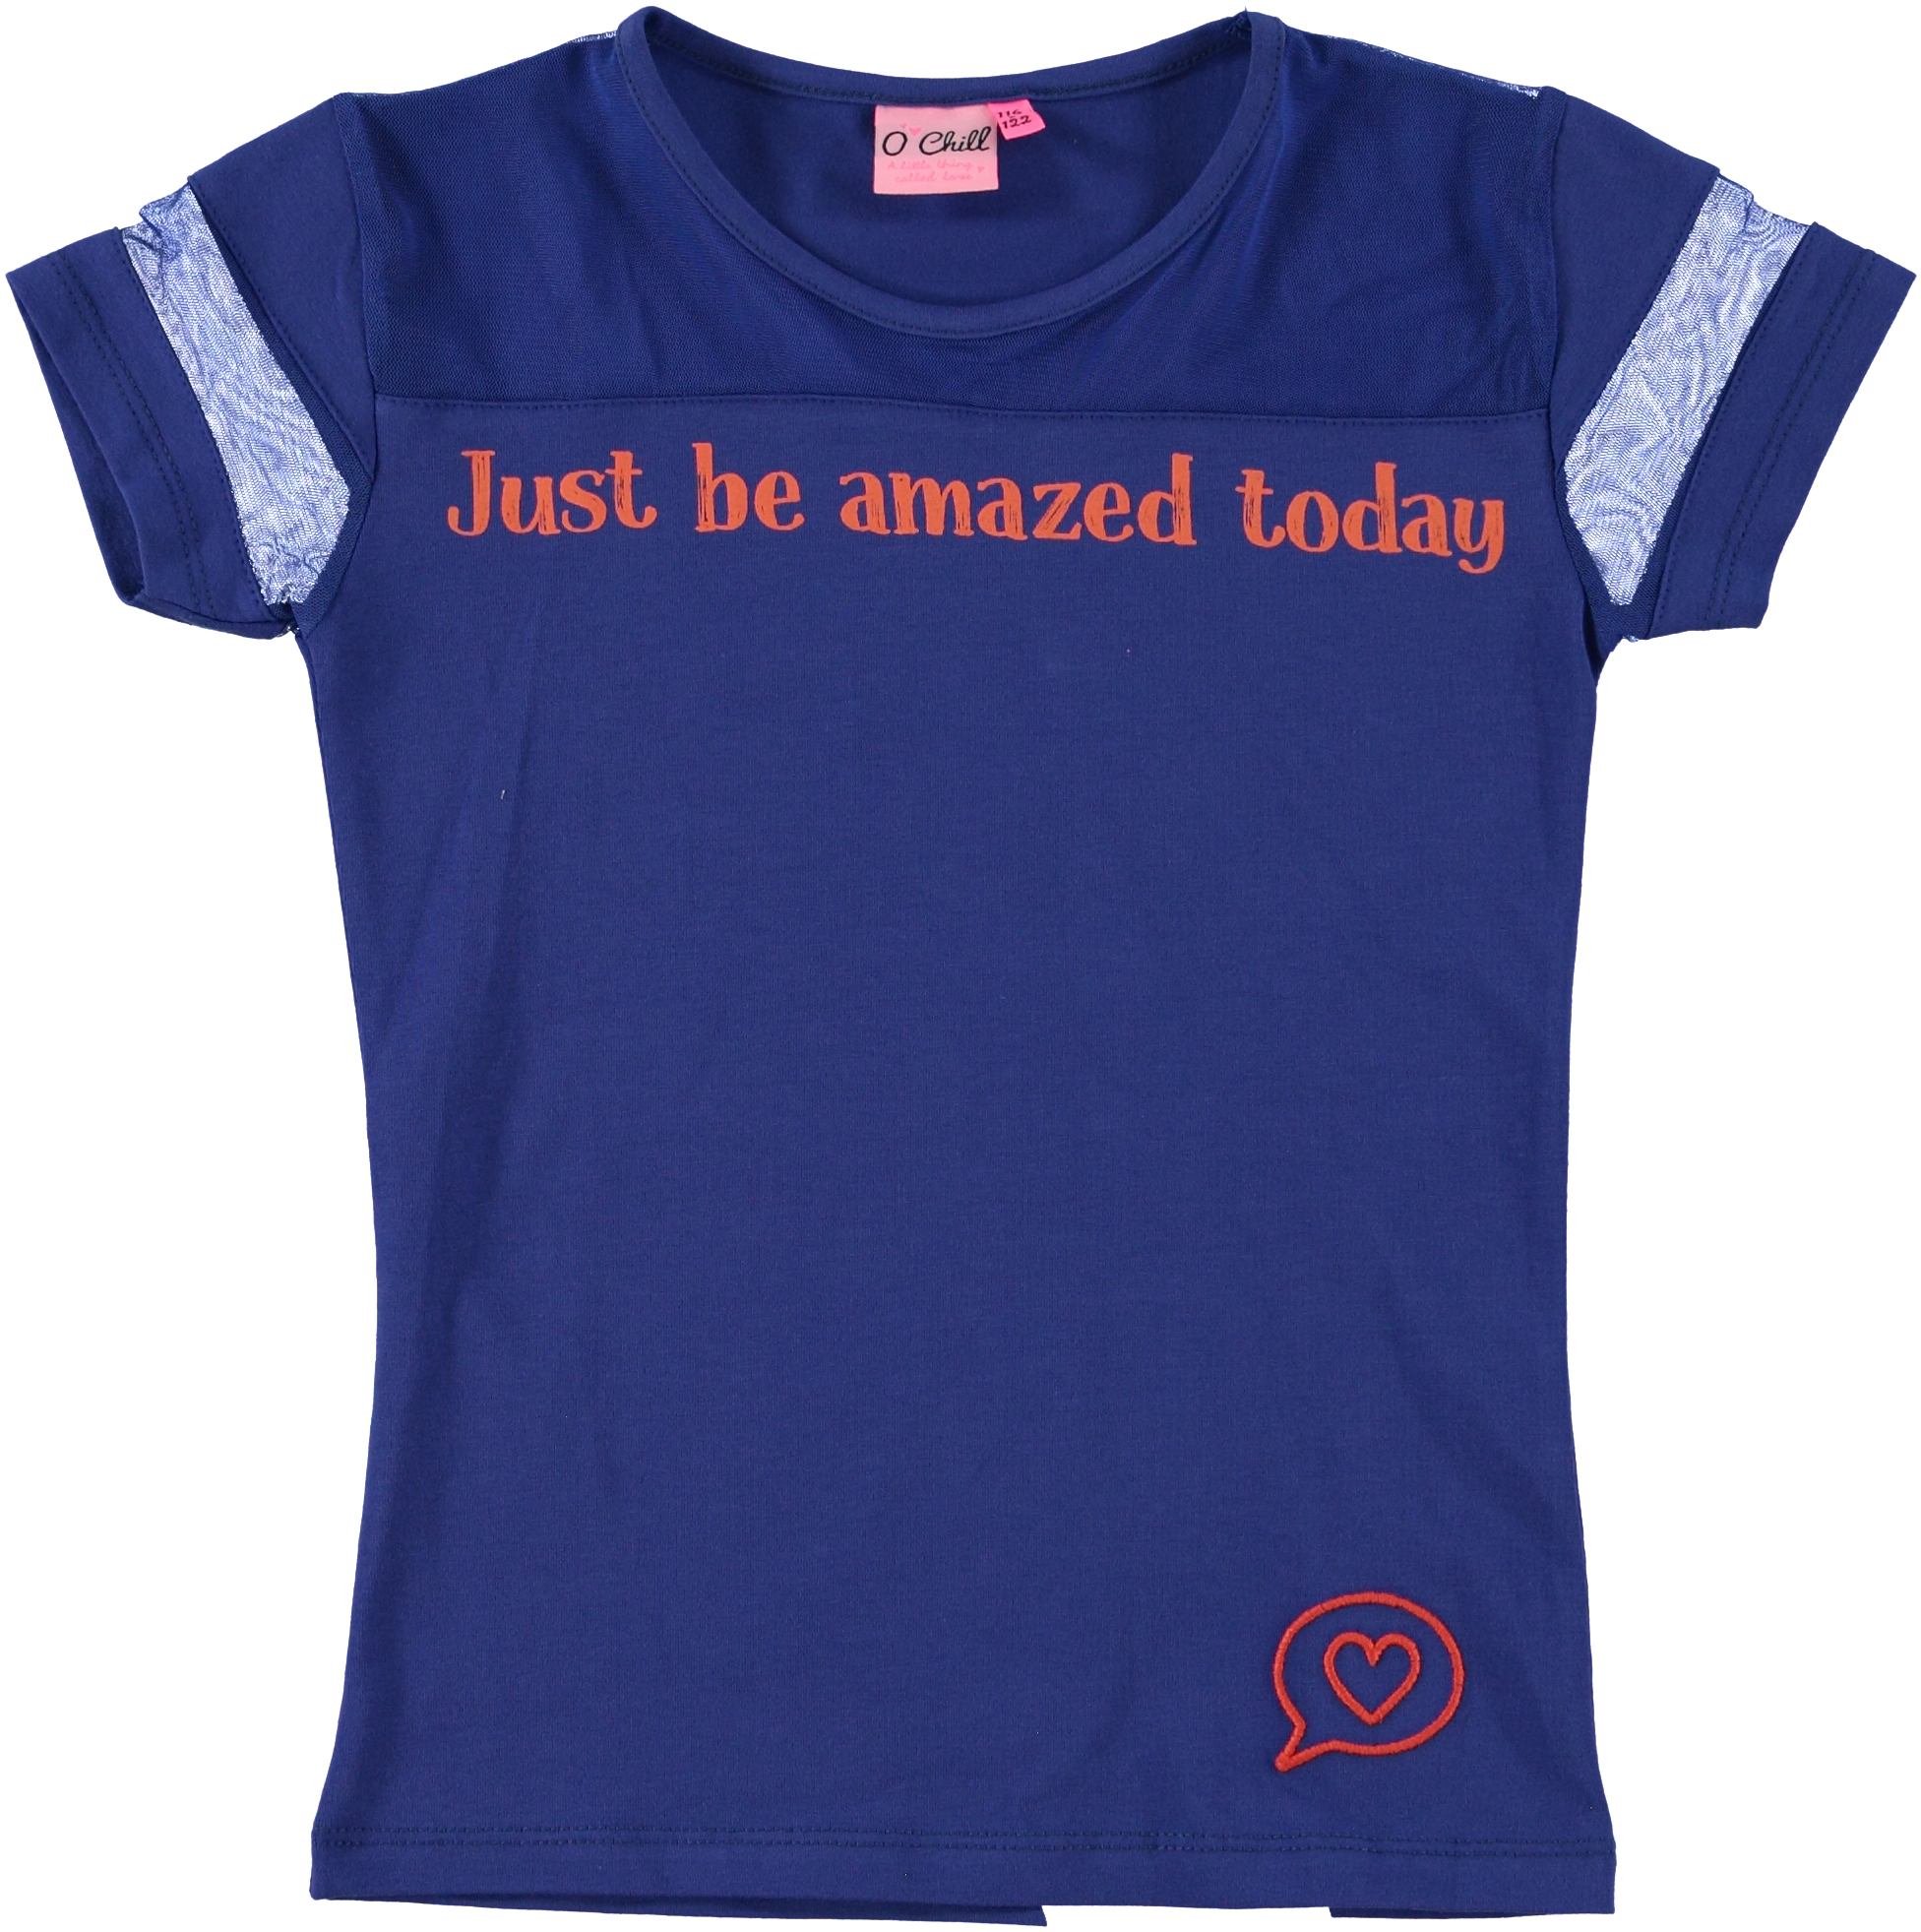 O-Chill Meisjes Shirt Dylana Blue-1